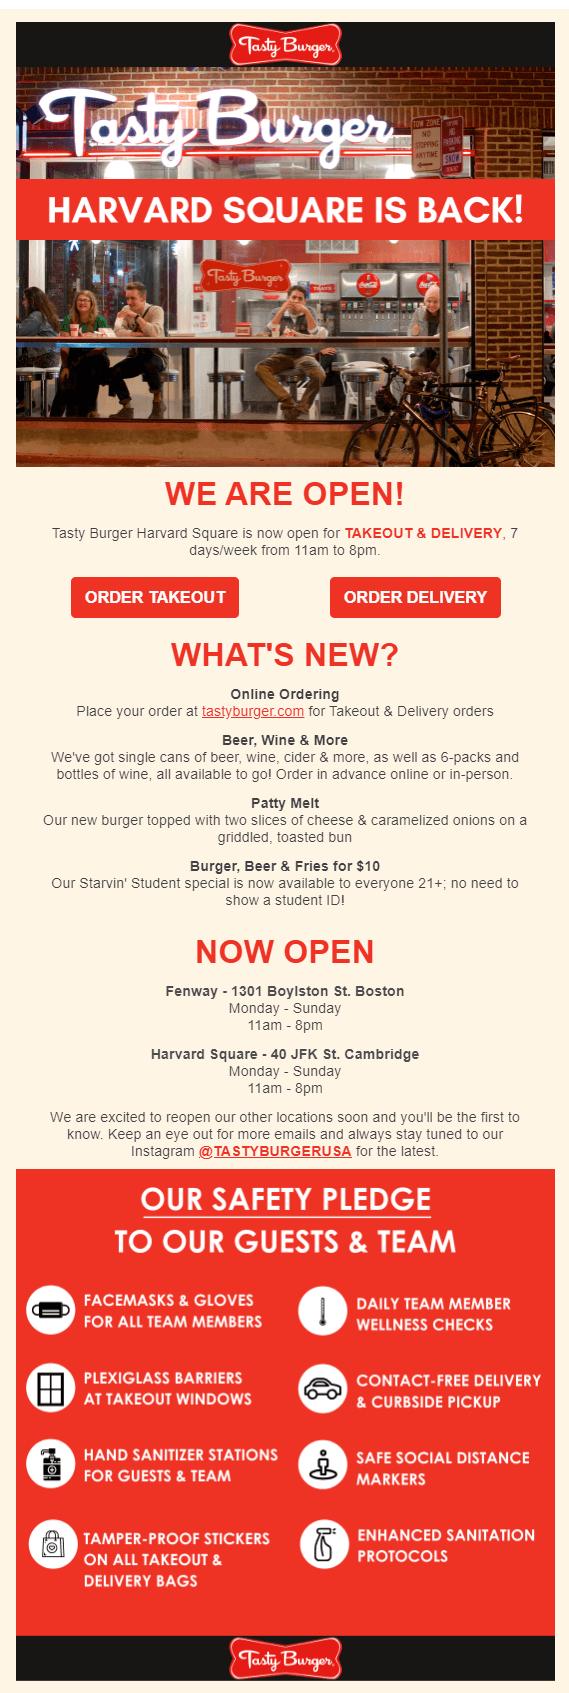 Email рассылка от Tasty Burger